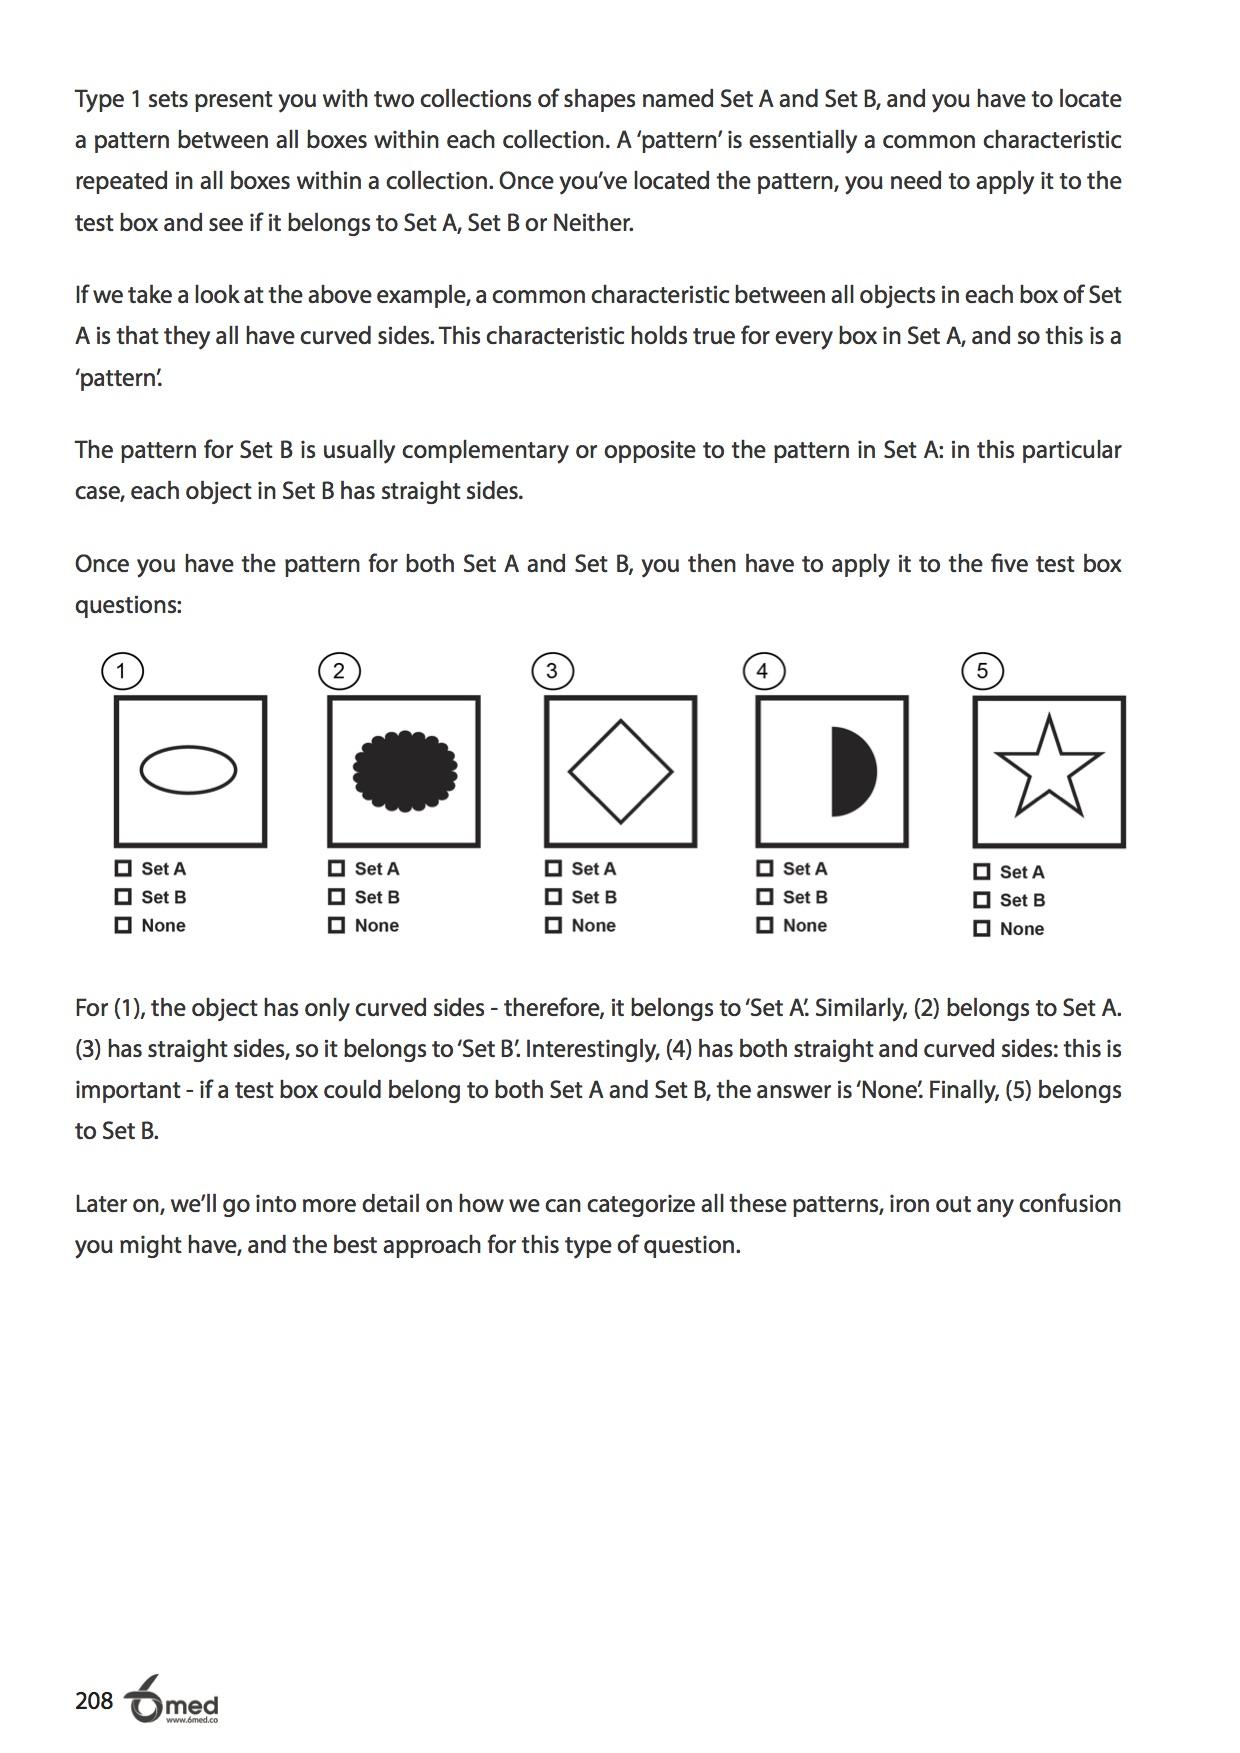 6med UCAT Crash Course Workbook - Abstract Reasoning